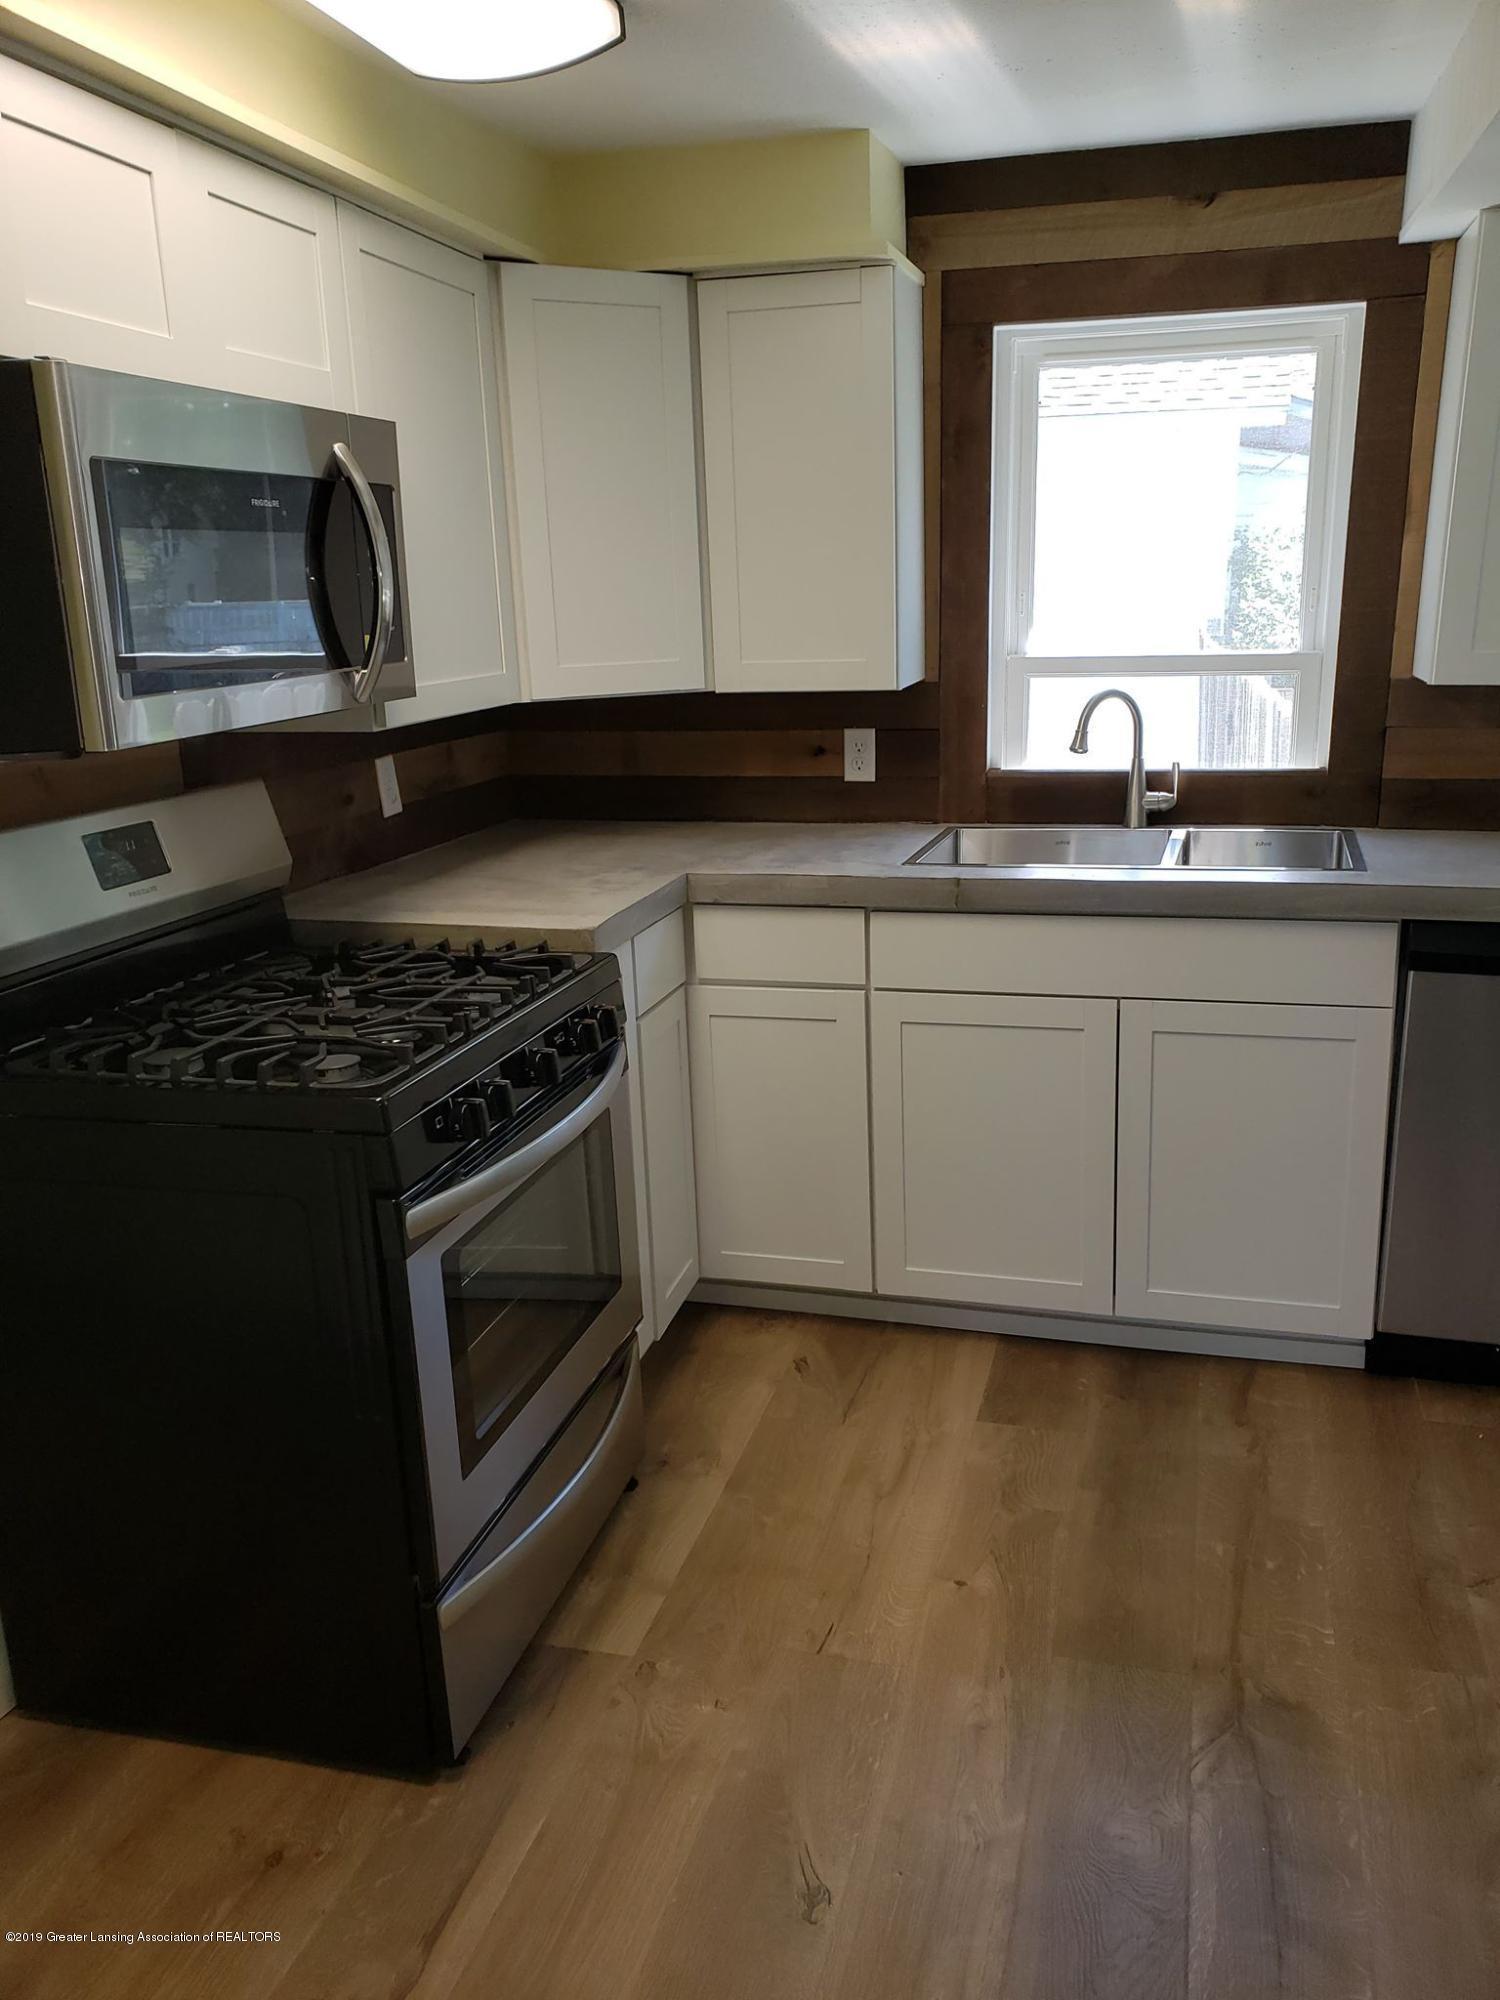 906 Hall St - Kitchen stove & Microwave - 26